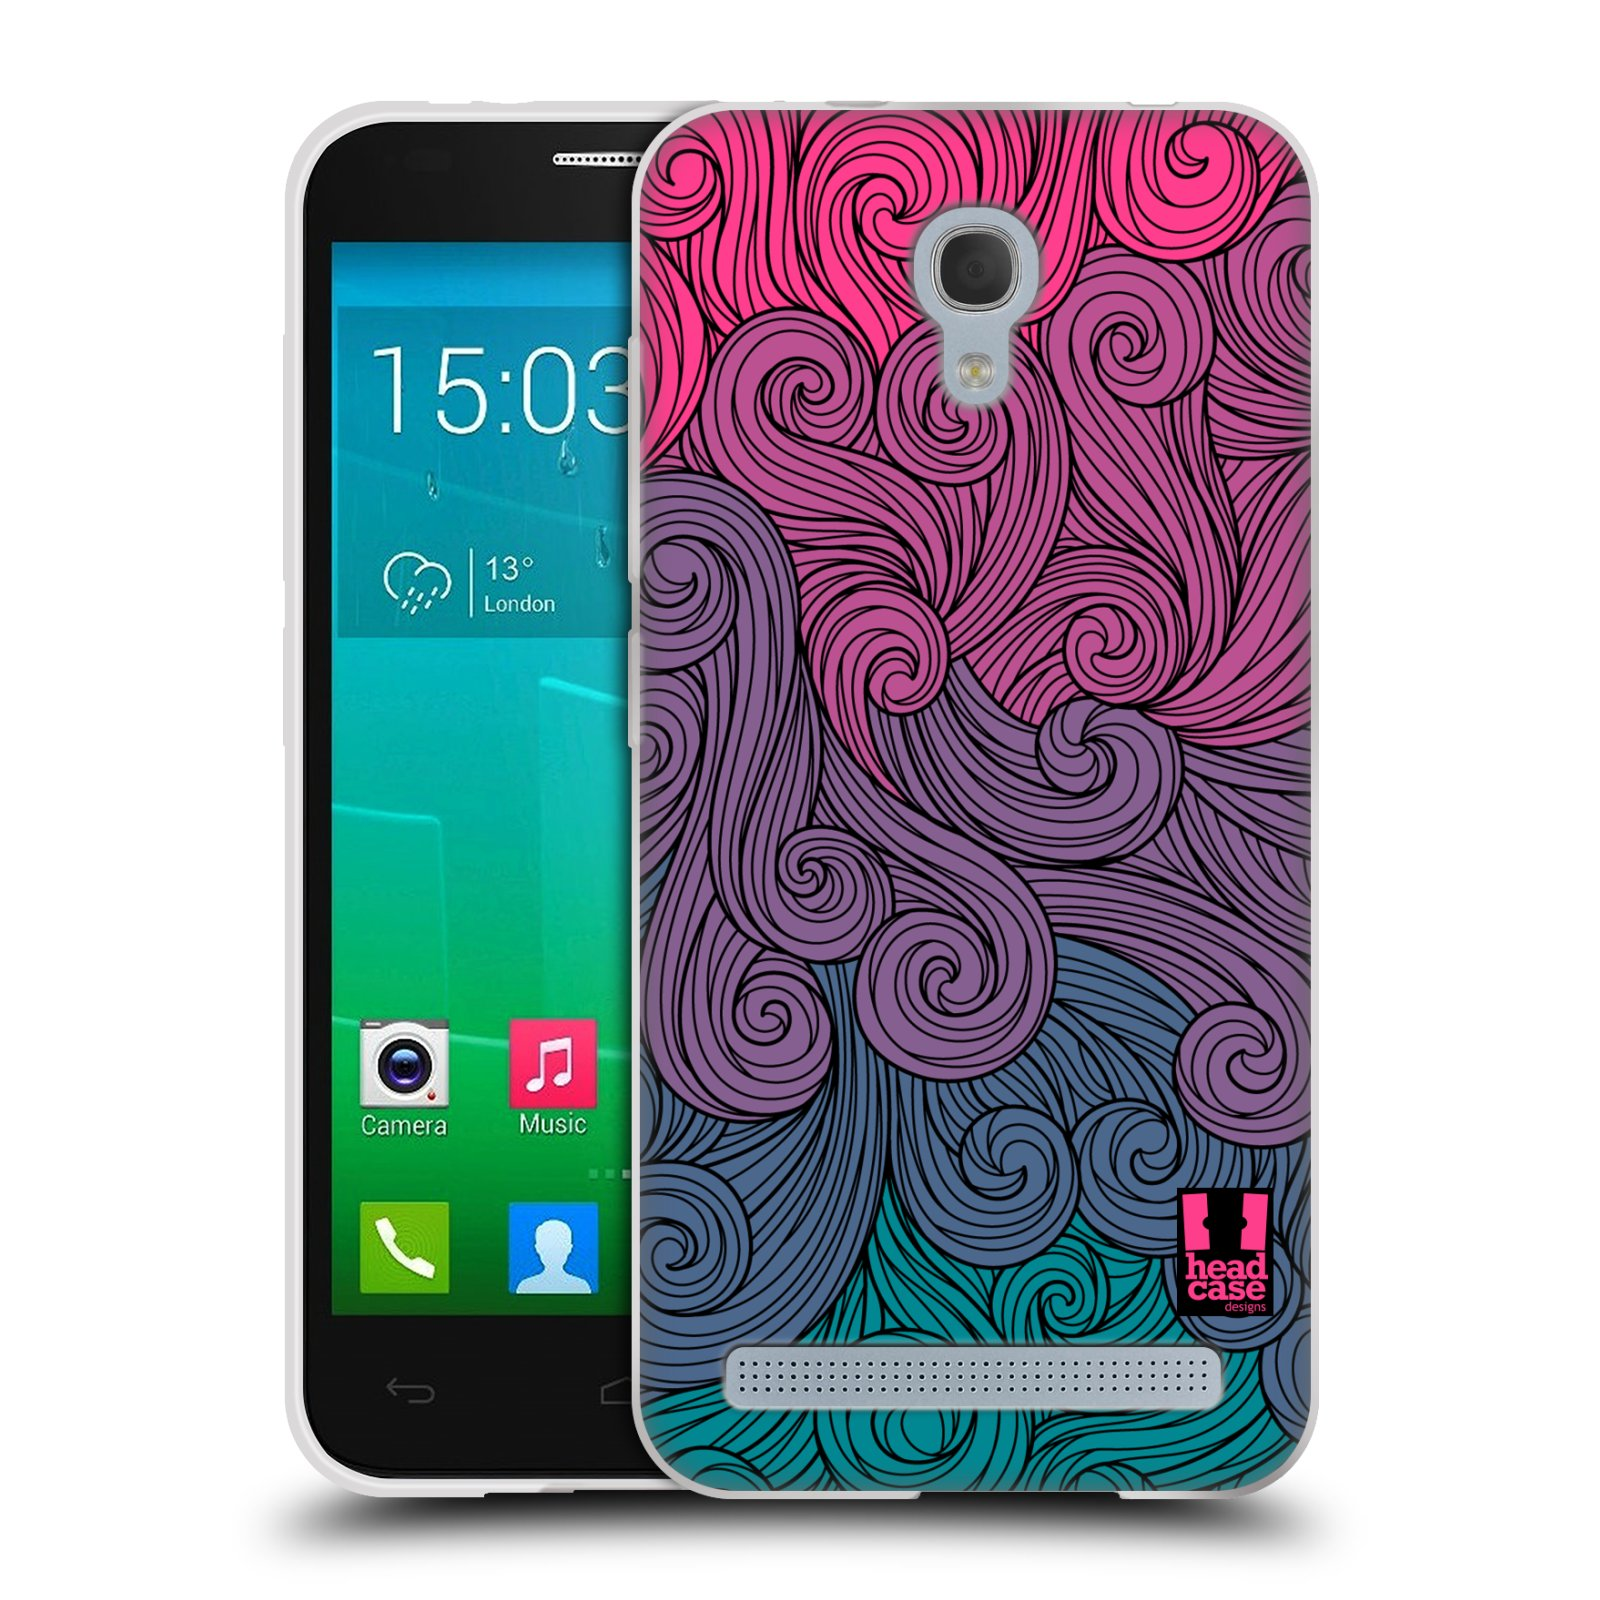 Silikonové pouzdro na mobil Alcatel One Touch Idol 2 Mini S 6036Y HEAD CASE Swirls Hot Pink (Silikonový kryt či obal na mobilní telefon Alcatel Idol 2 Mini S OT-6036Y)